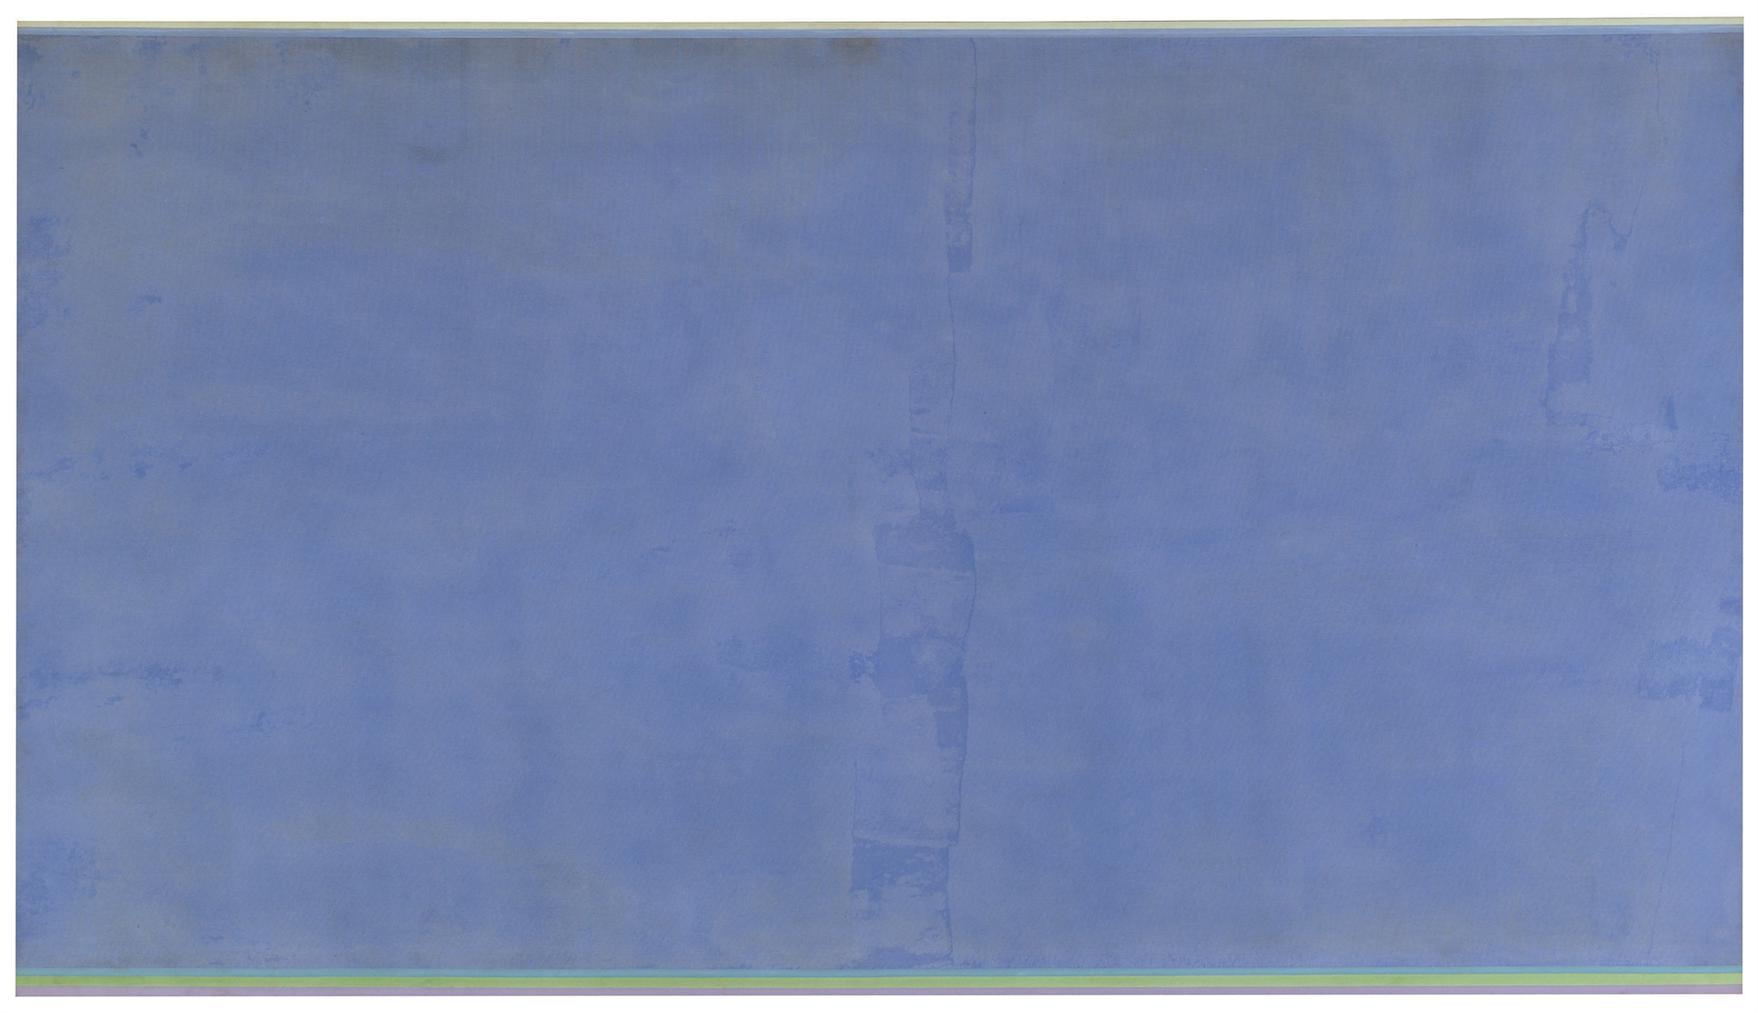 Kenneth Noland-Rare Day-1970